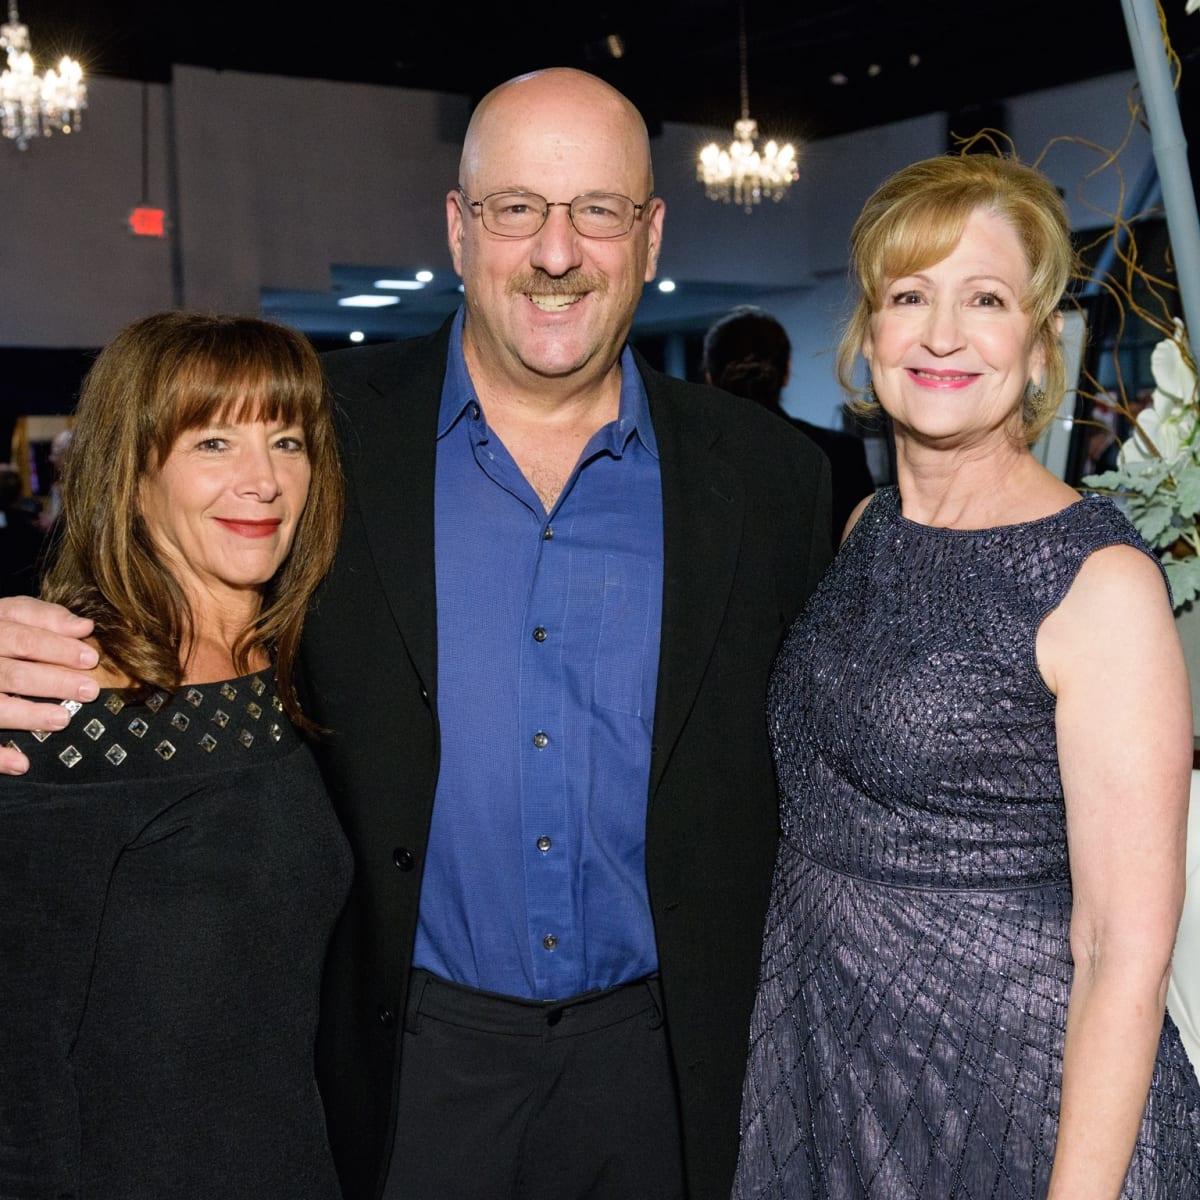 Halo House gala Fran and Lou Kleinman, gala co-chair Dena Wilson